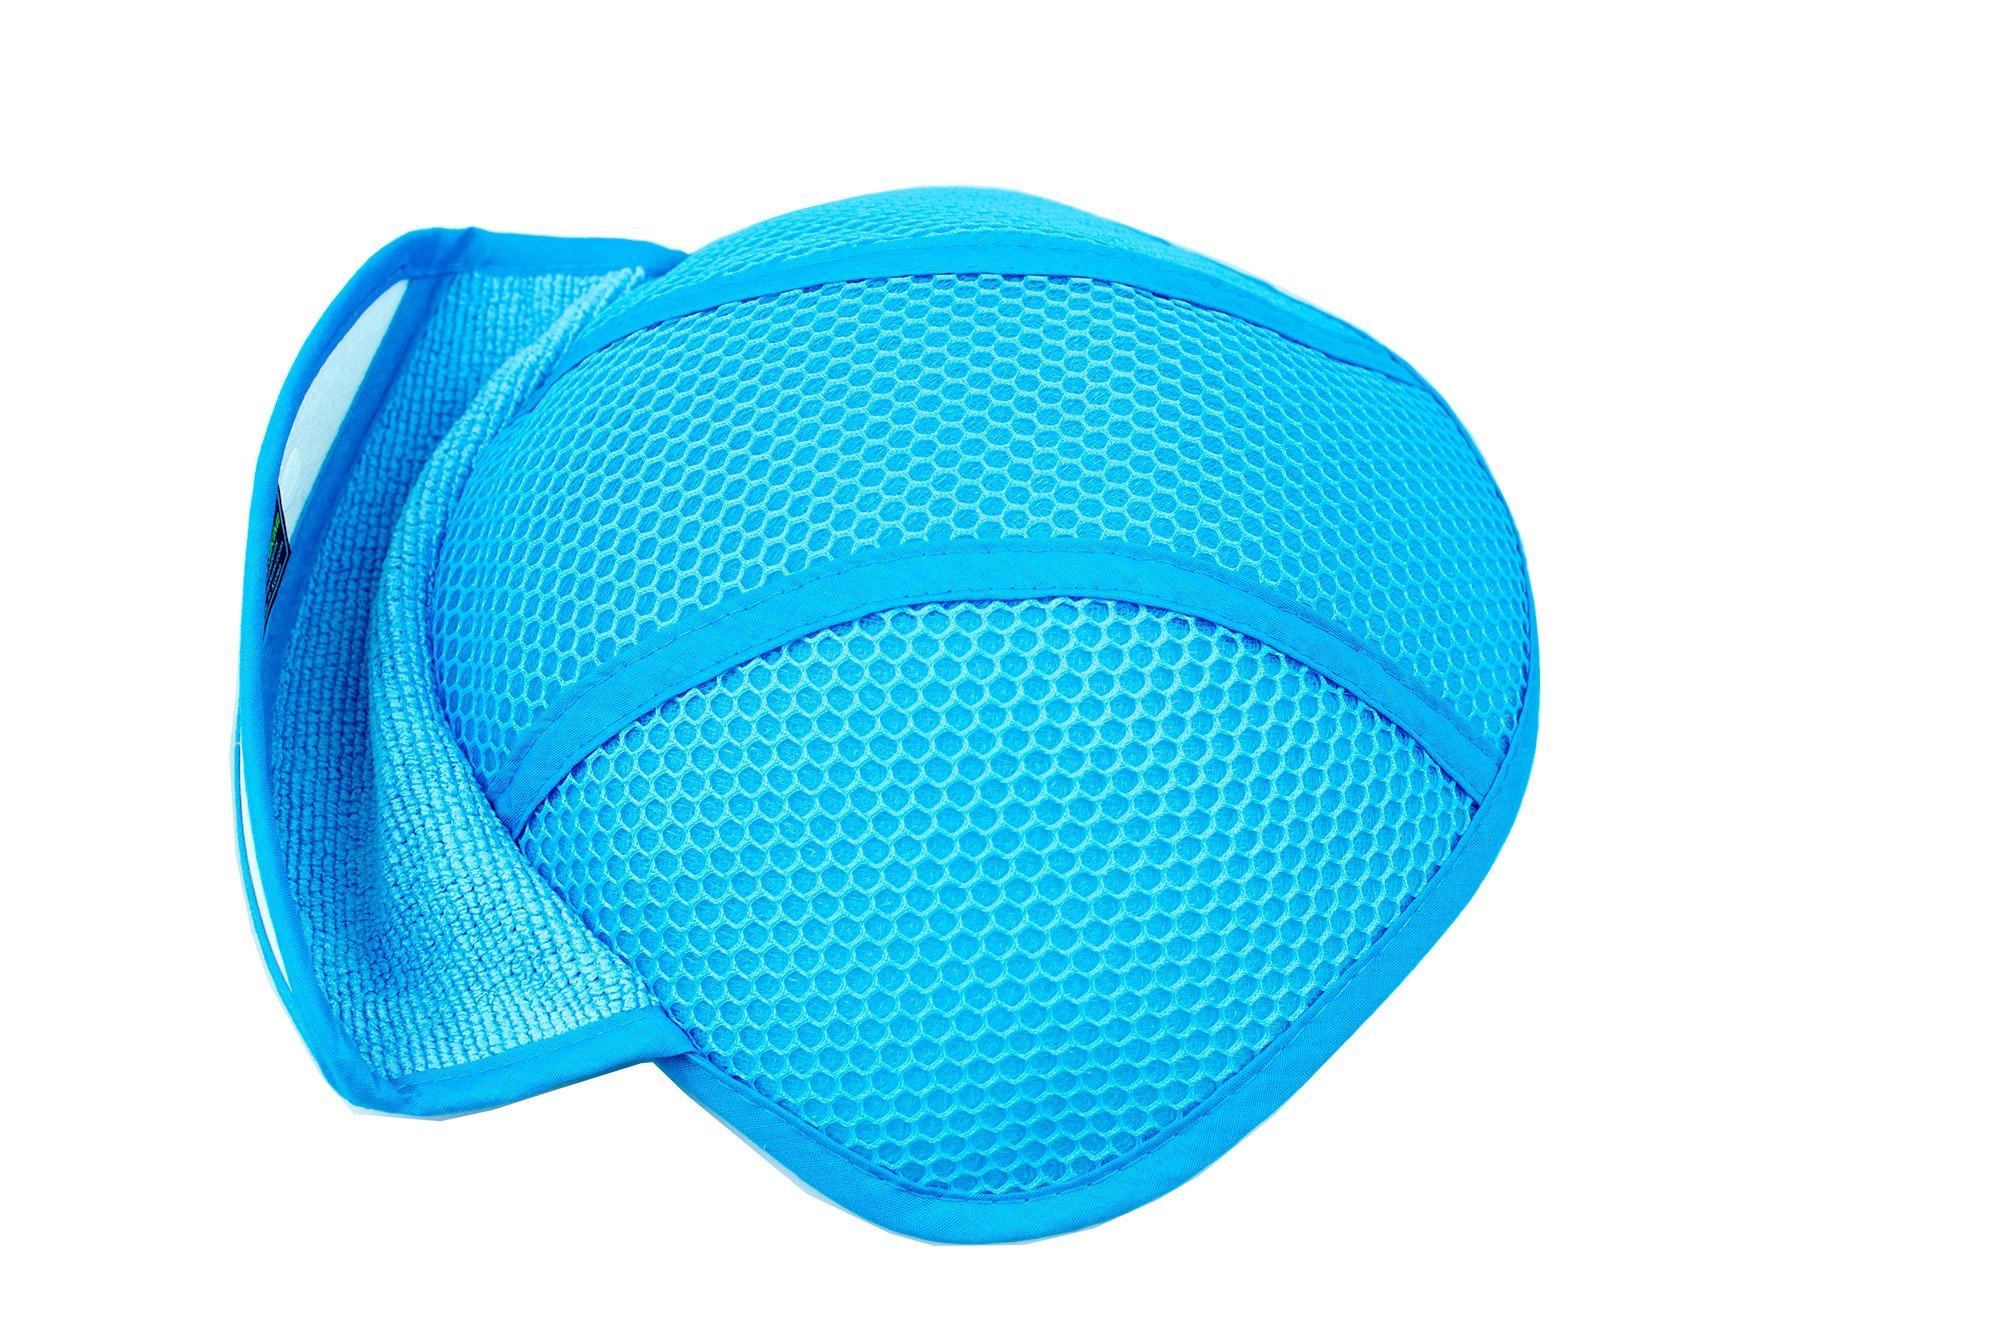 MegaTrue 3PCK Hard Hat 3D Air Mesh Insert Cooling Pad (Microfiber) by Cooling gear (Image #4)